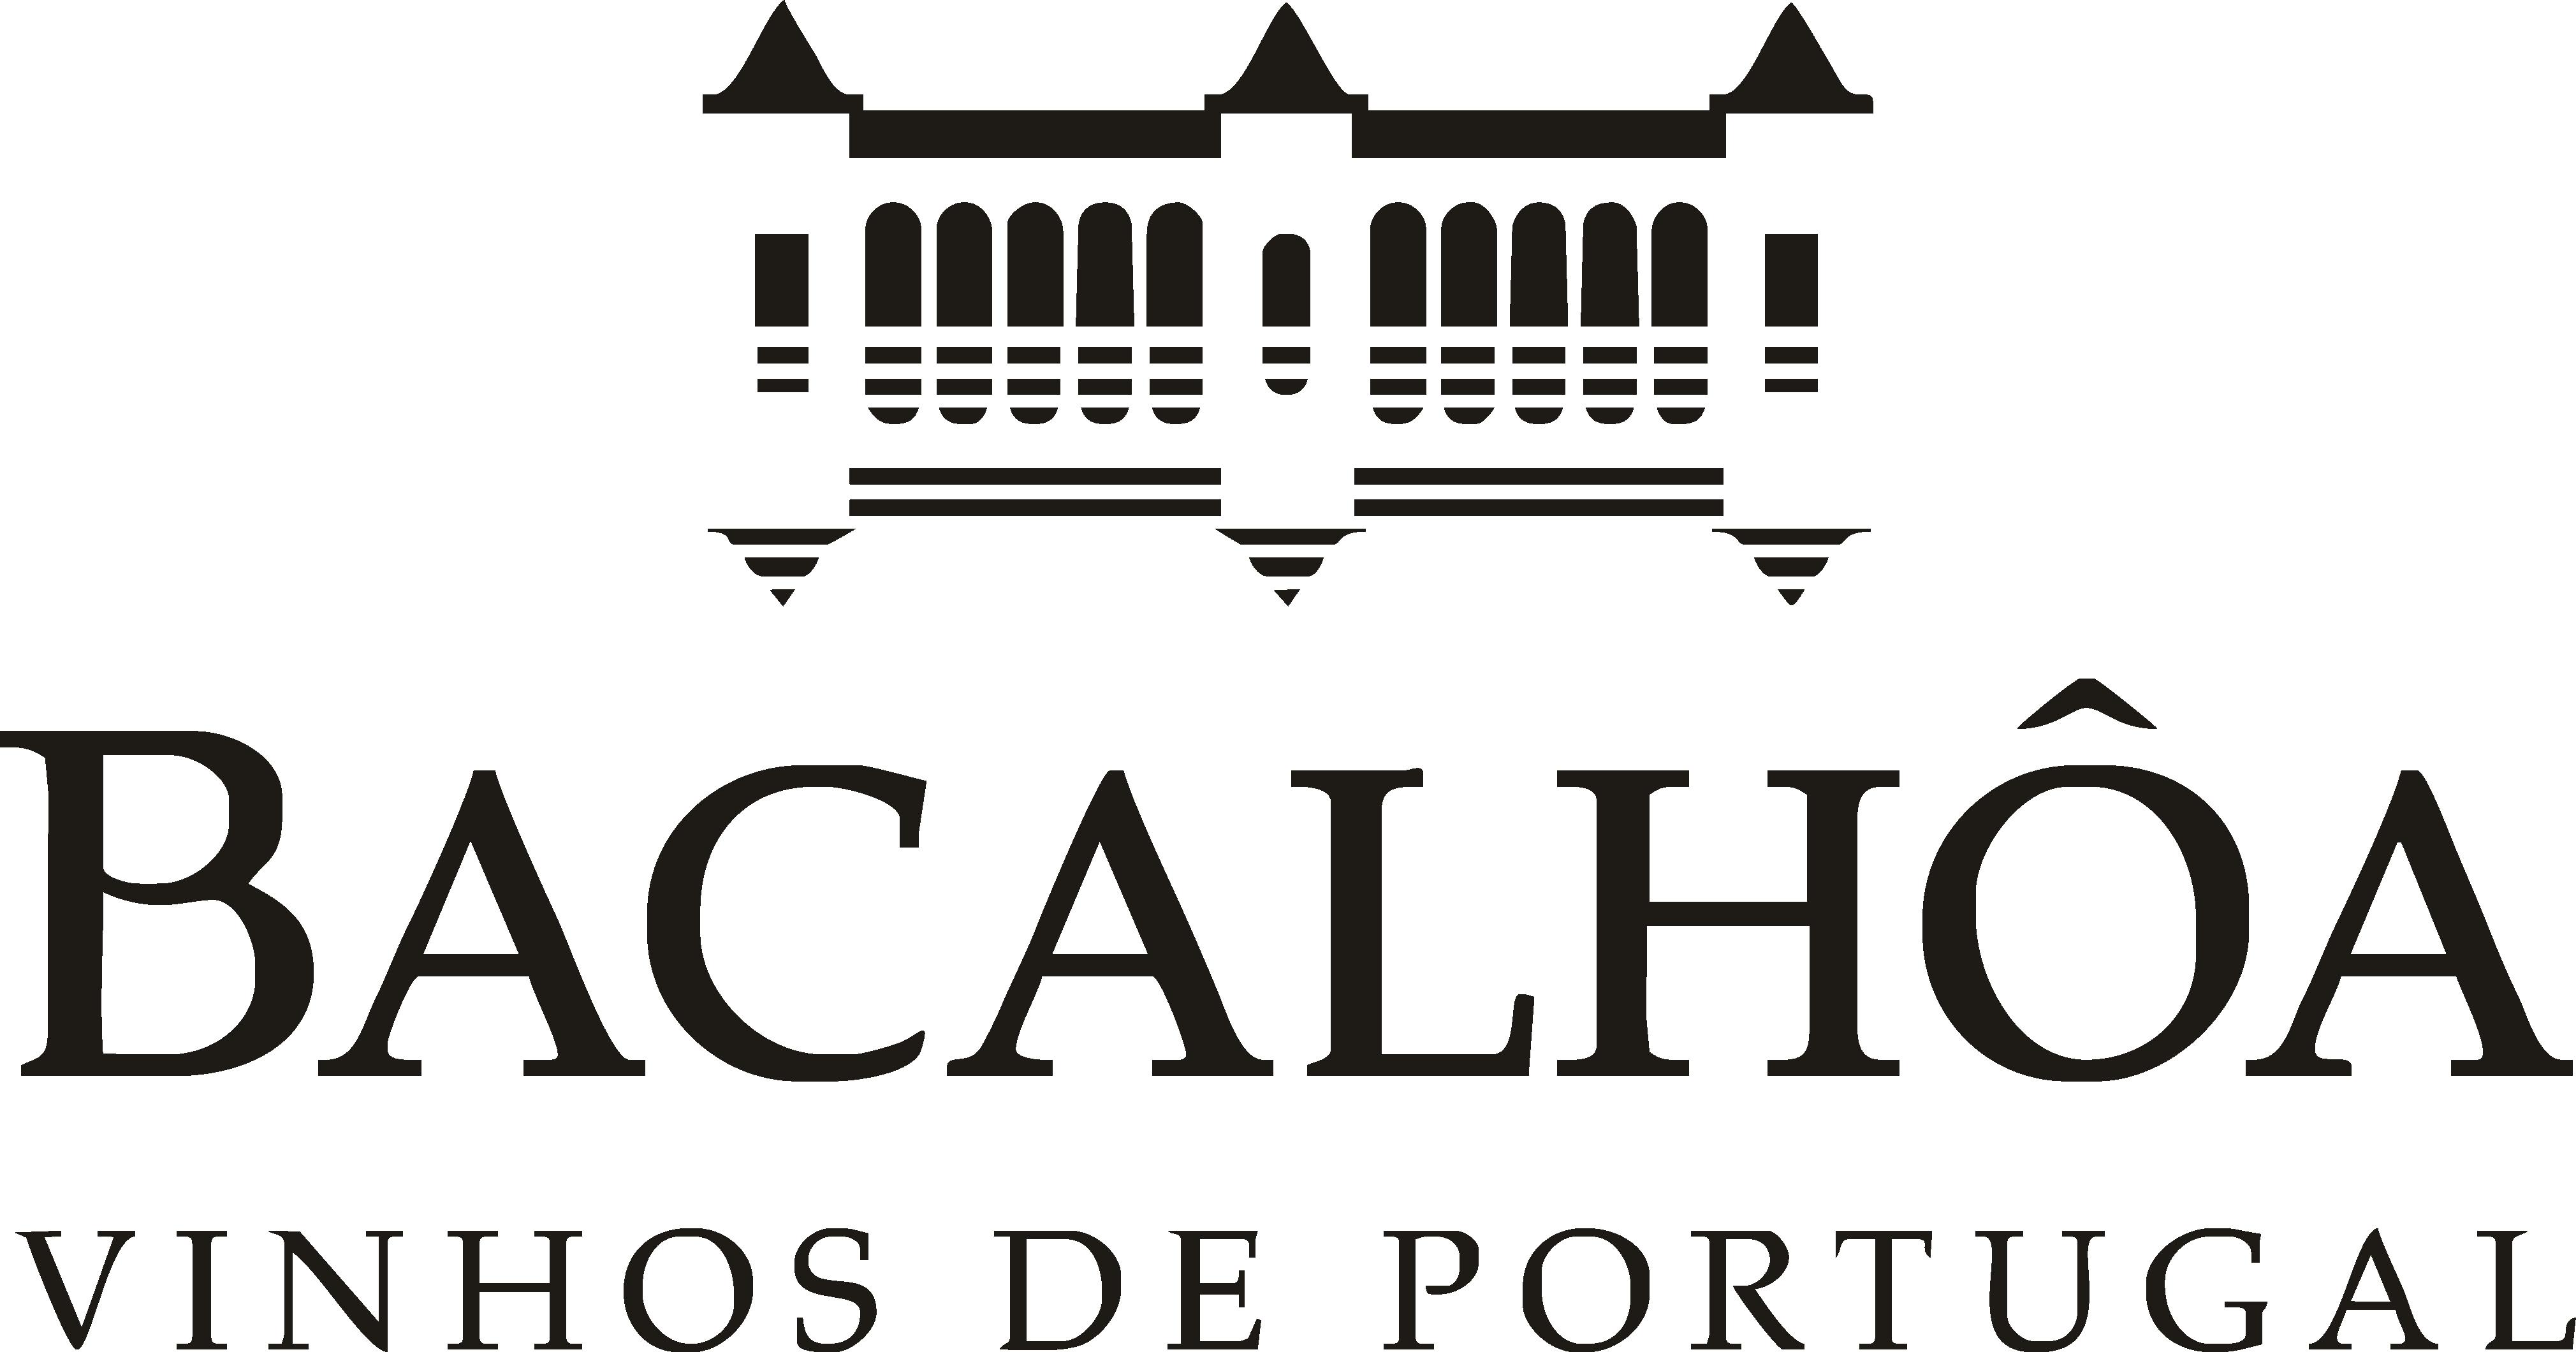 Bacalhôa Vinhos de Portugal